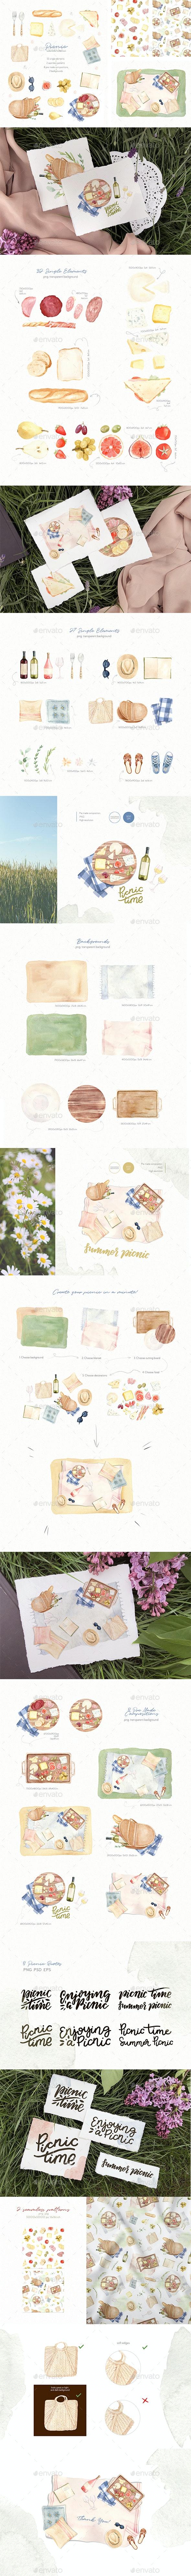 Picnic Time - Watercolor Illustration Set - Nature Backgrounds